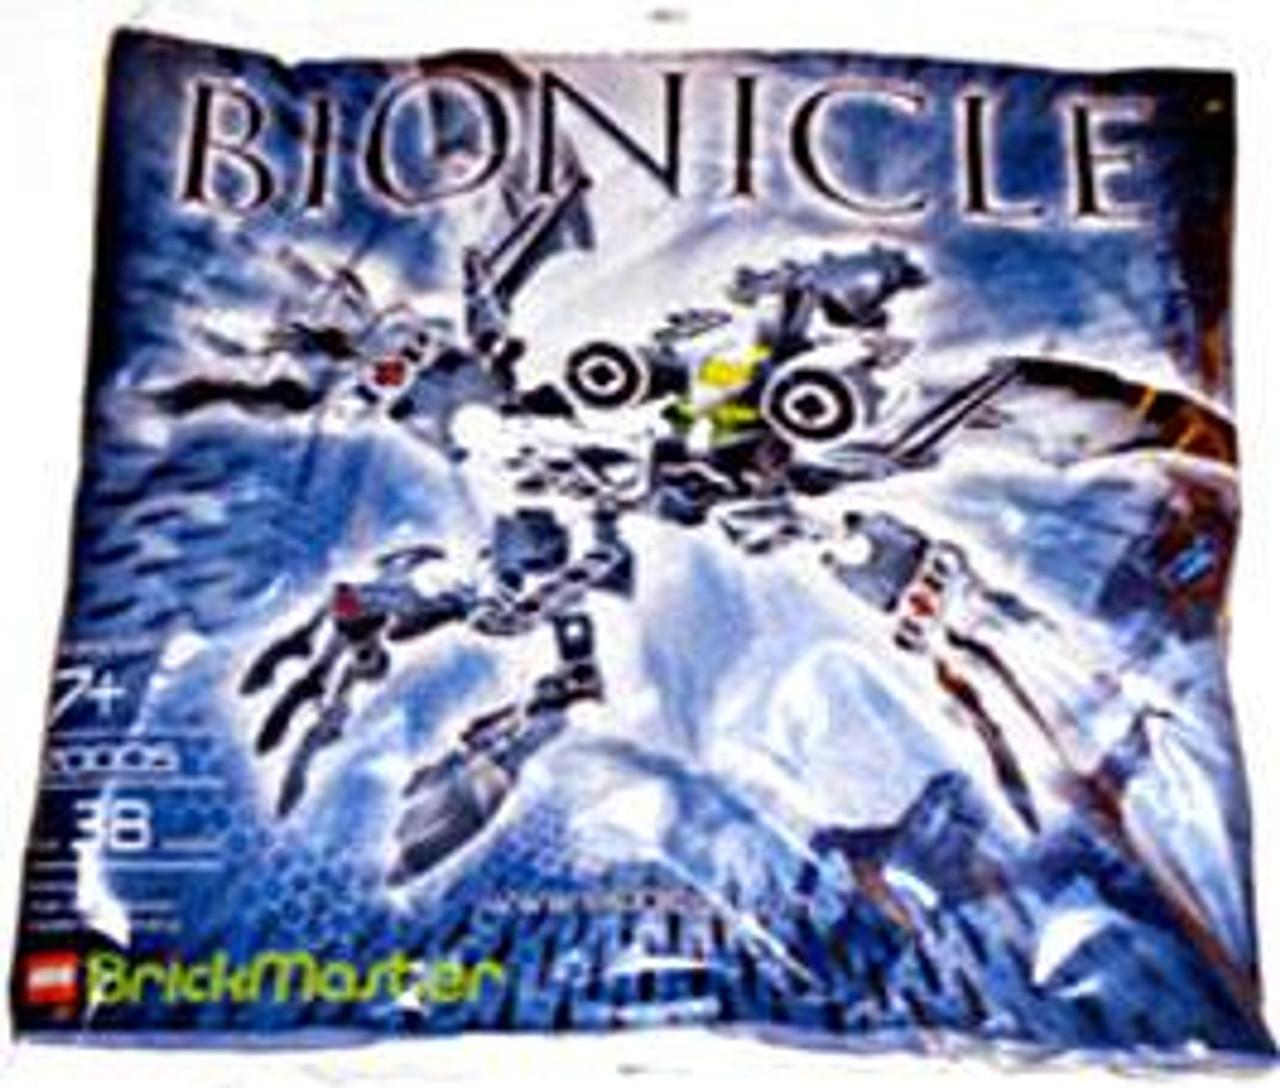 LEGO Bionicle BrickMaster Winged Rahi Exclusive Mini Set #20005 [Bagged]